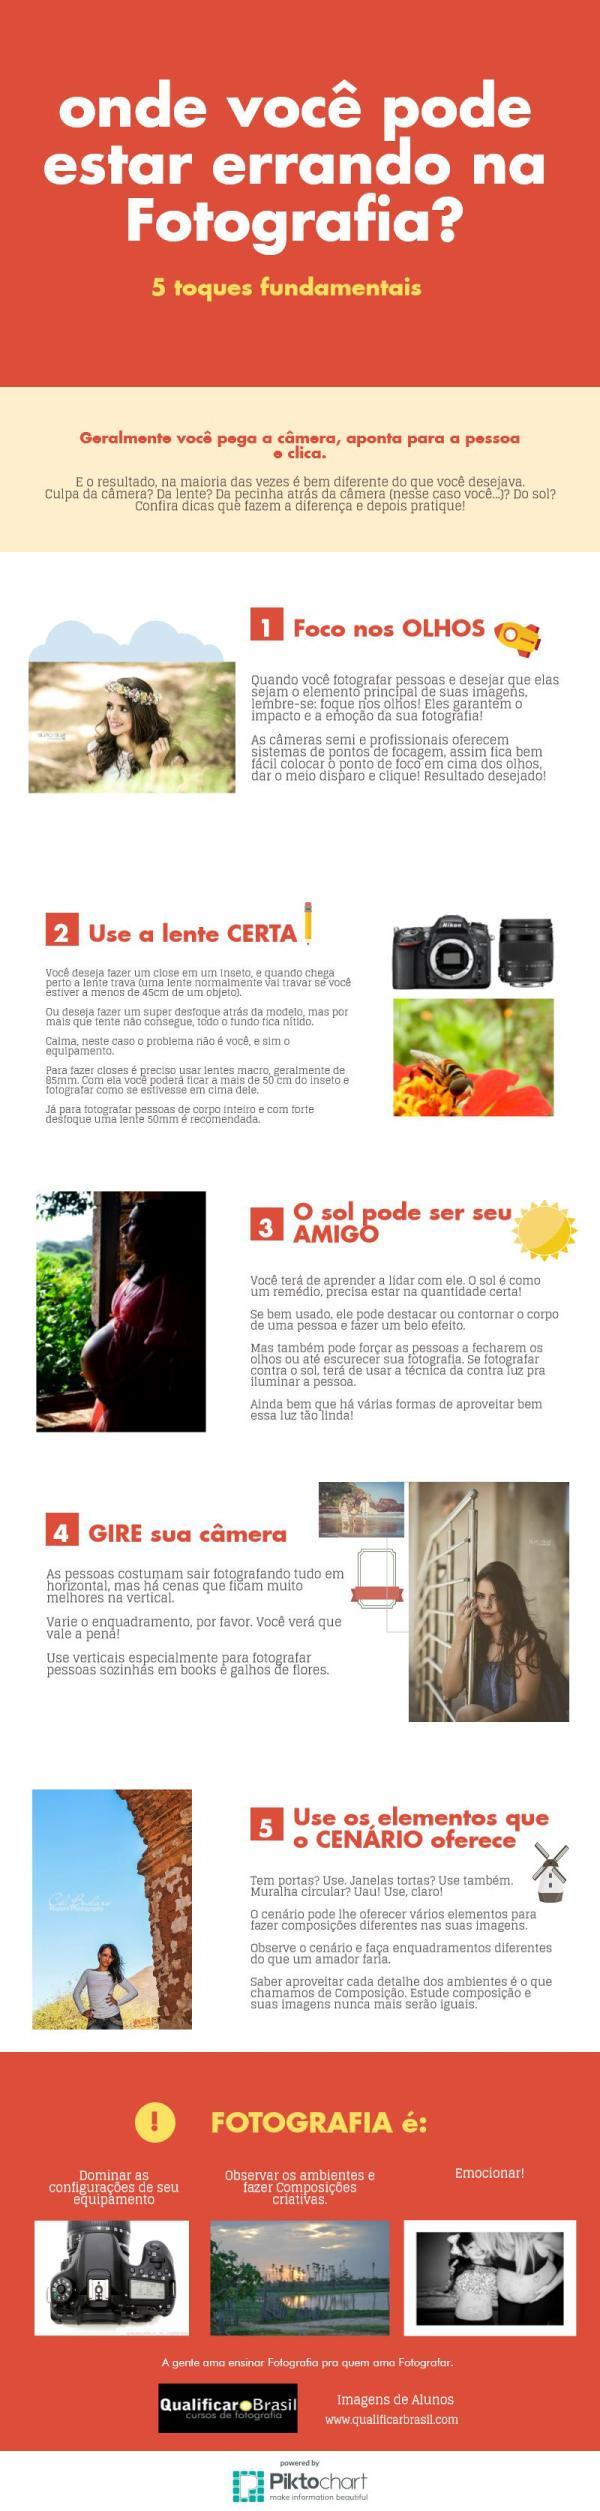 infografico-5-toques-na-fotografia